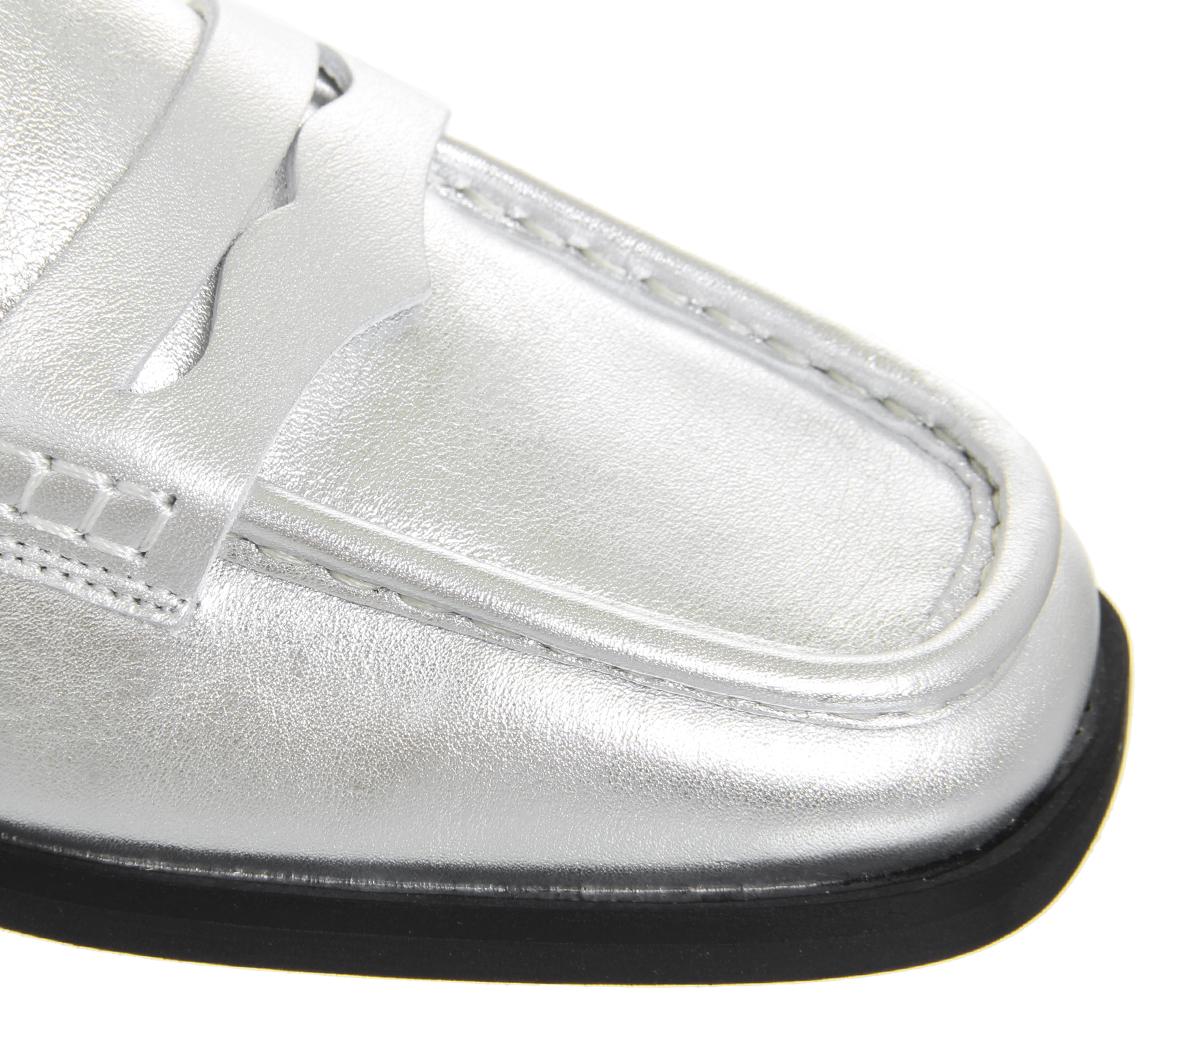 Damenschuhe Toe Office Fashion Show Square Toe Damenschuhe Loafers SILVER LEATHER Flats 646603